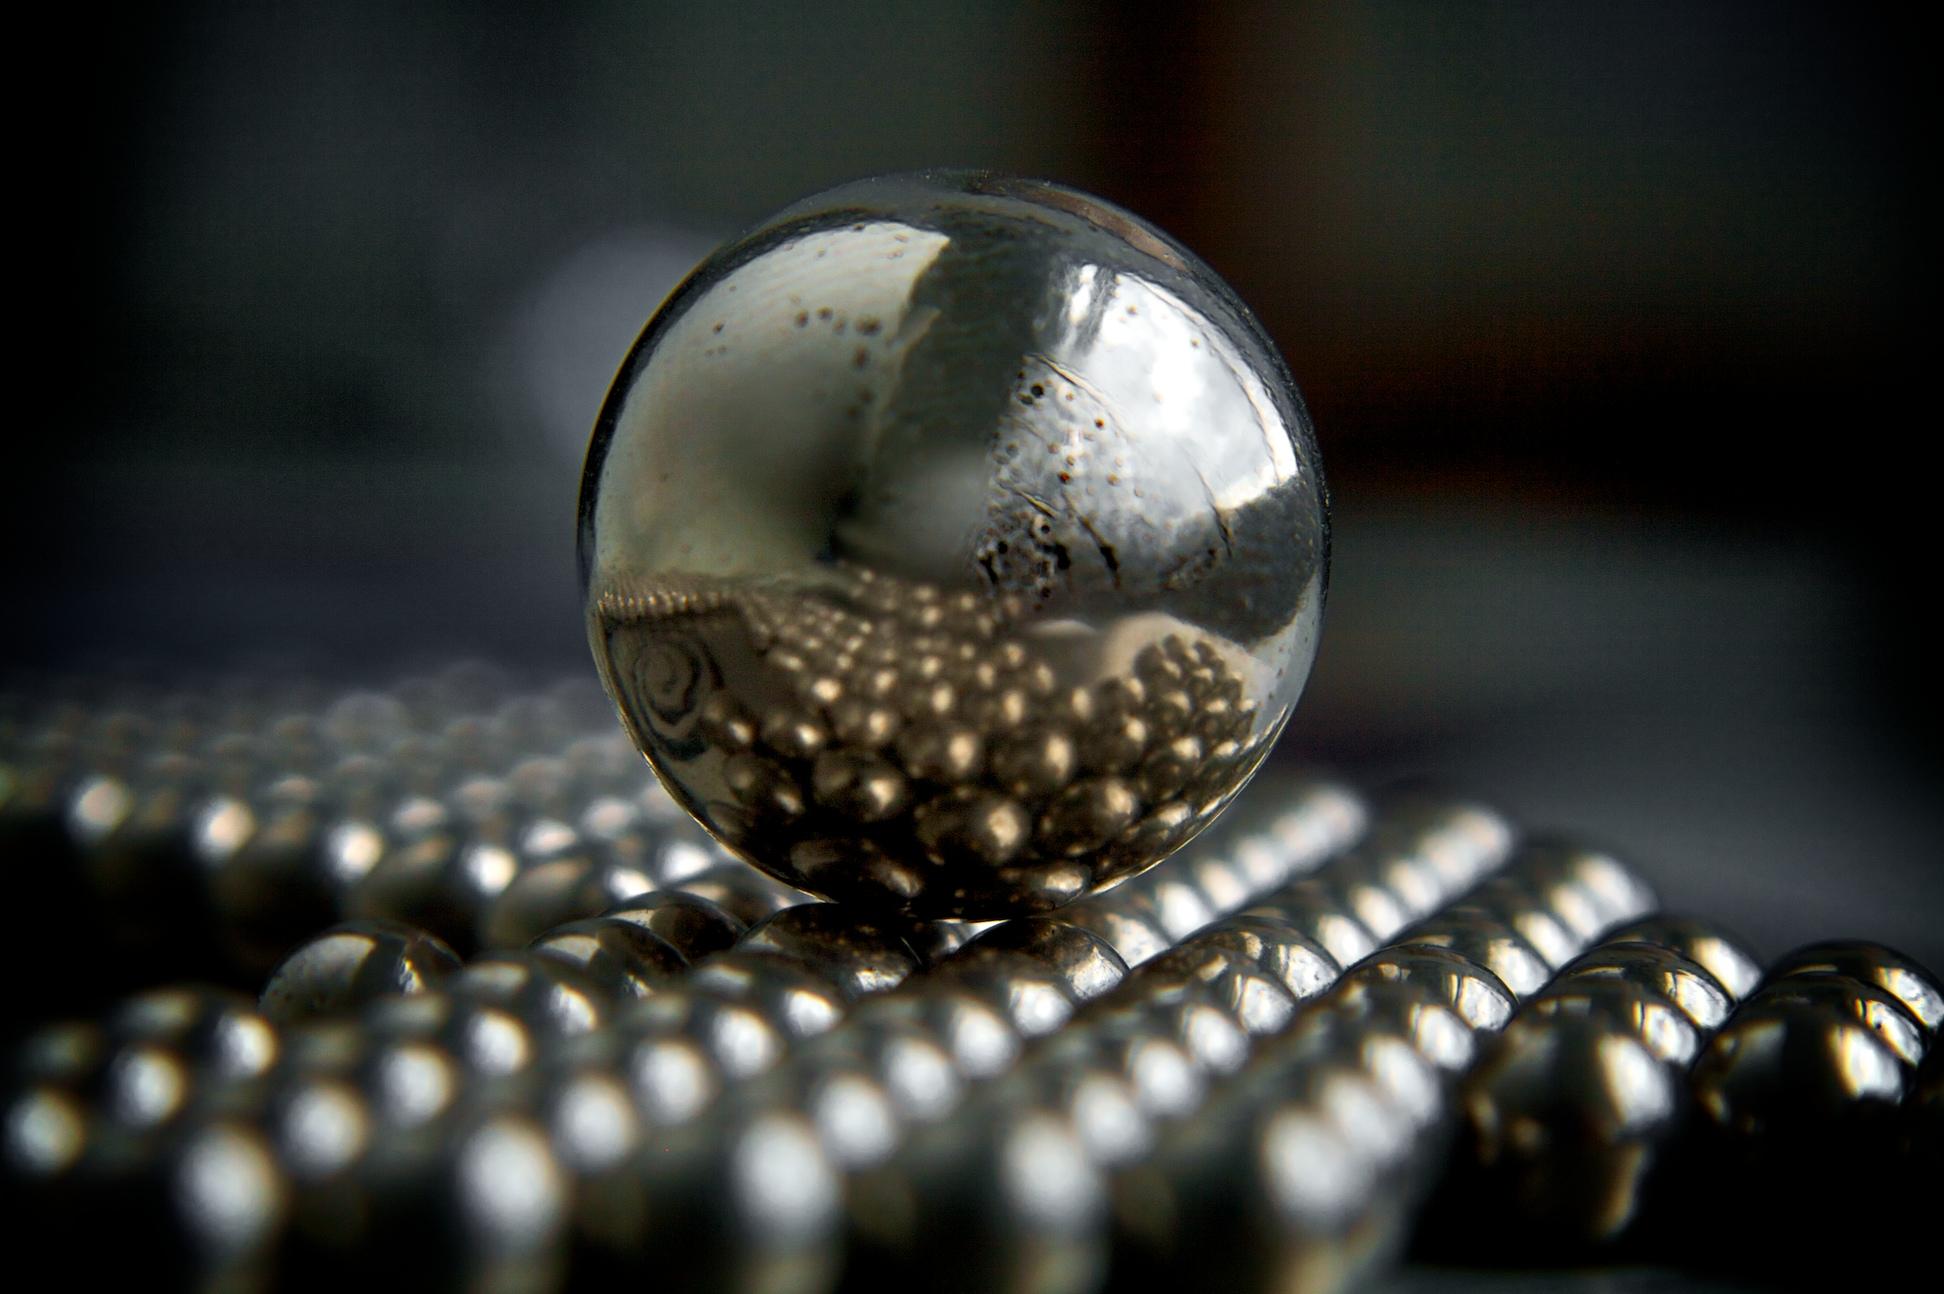 Fisheye lens effect on ball